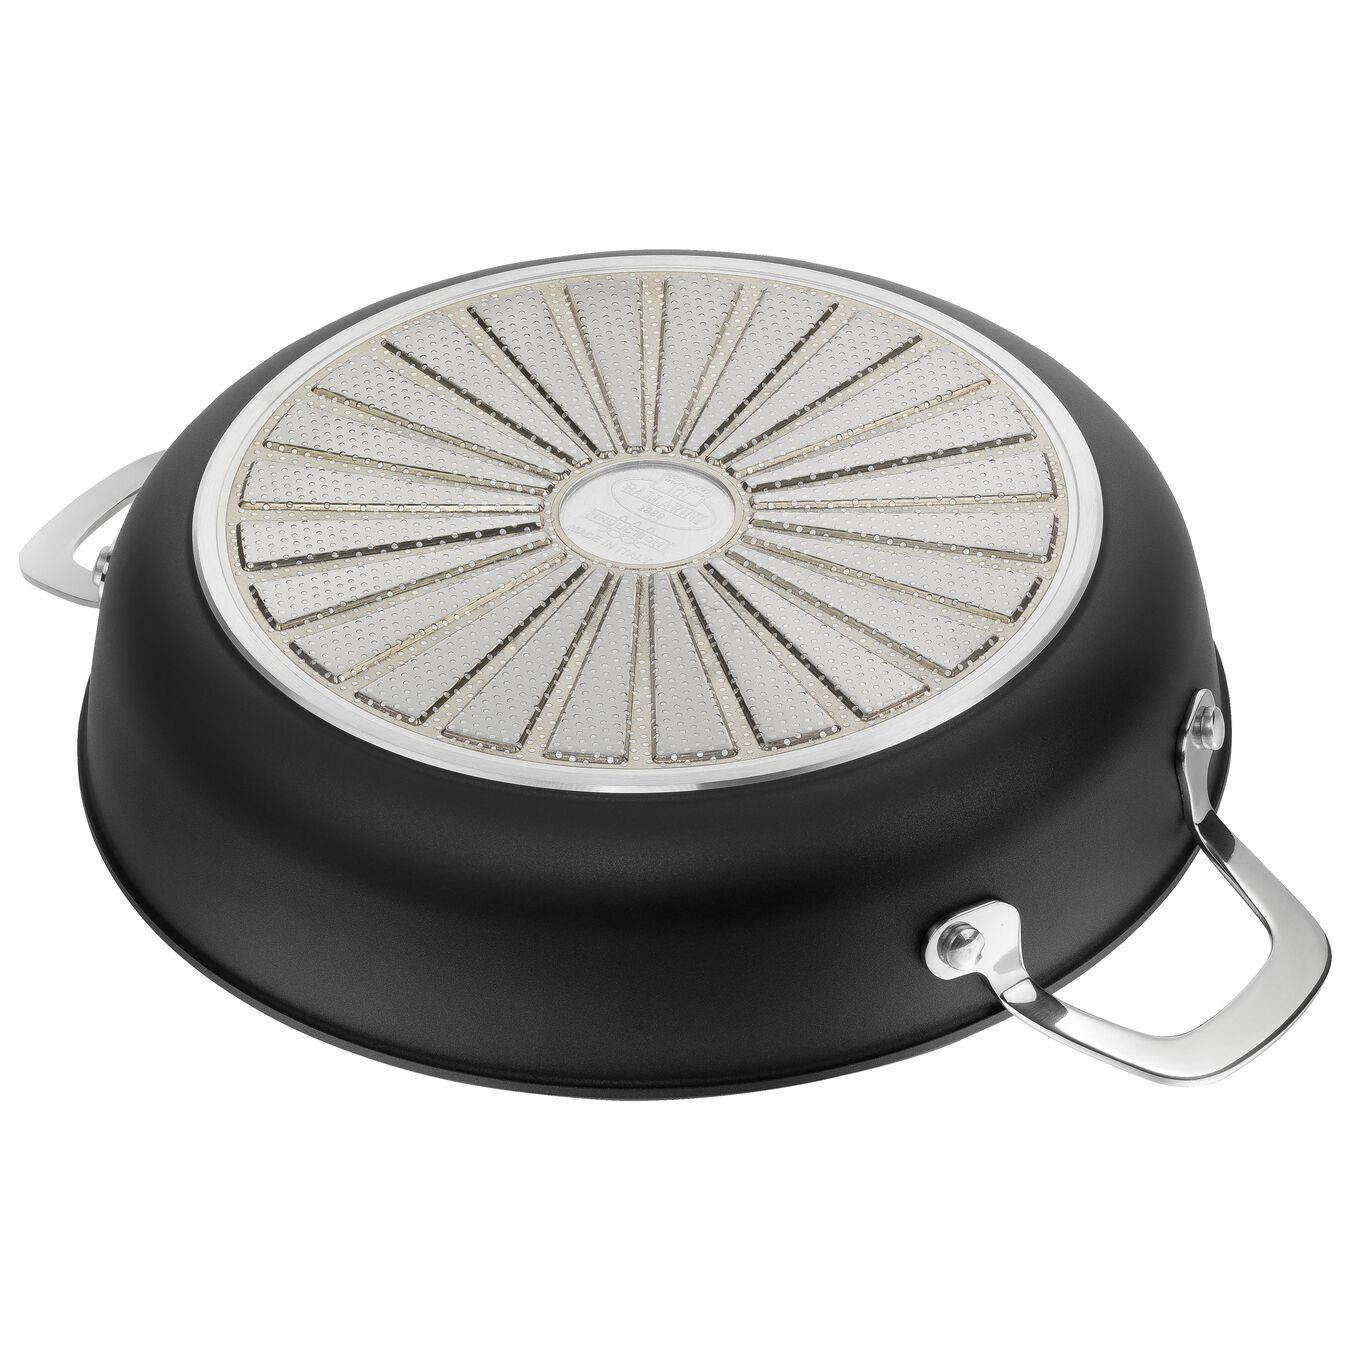 round Saucier and sauteuse, black,,large 4